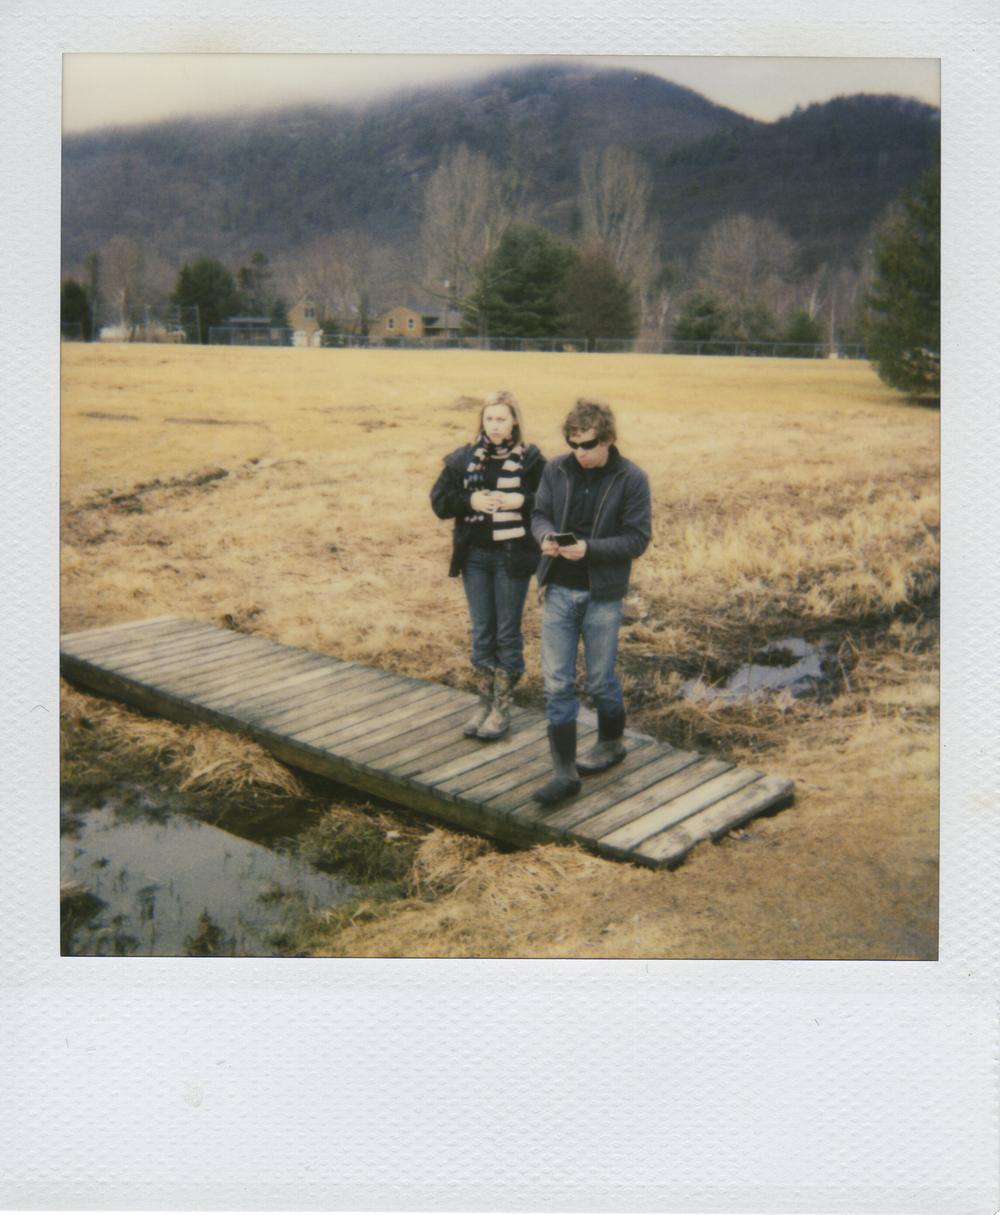 jlaurence-polaroid-027.jpg